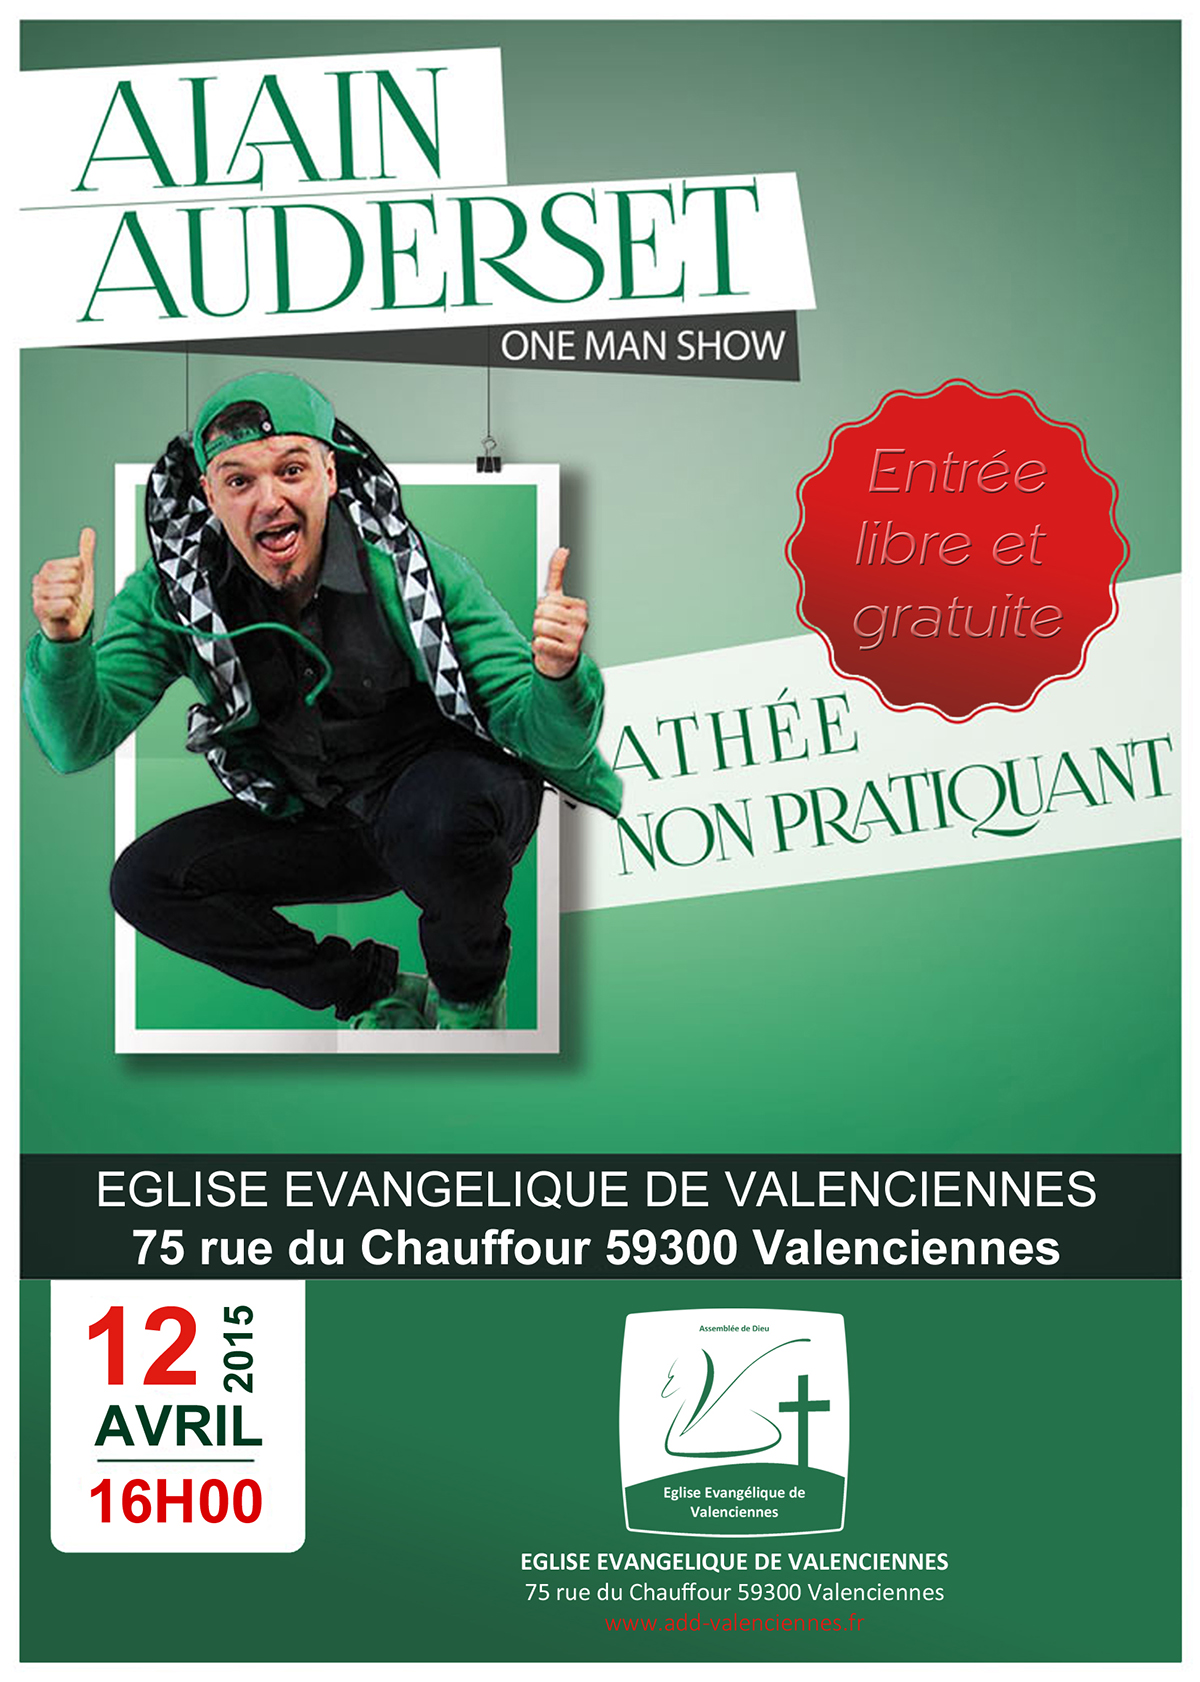 Valenciennes auderset